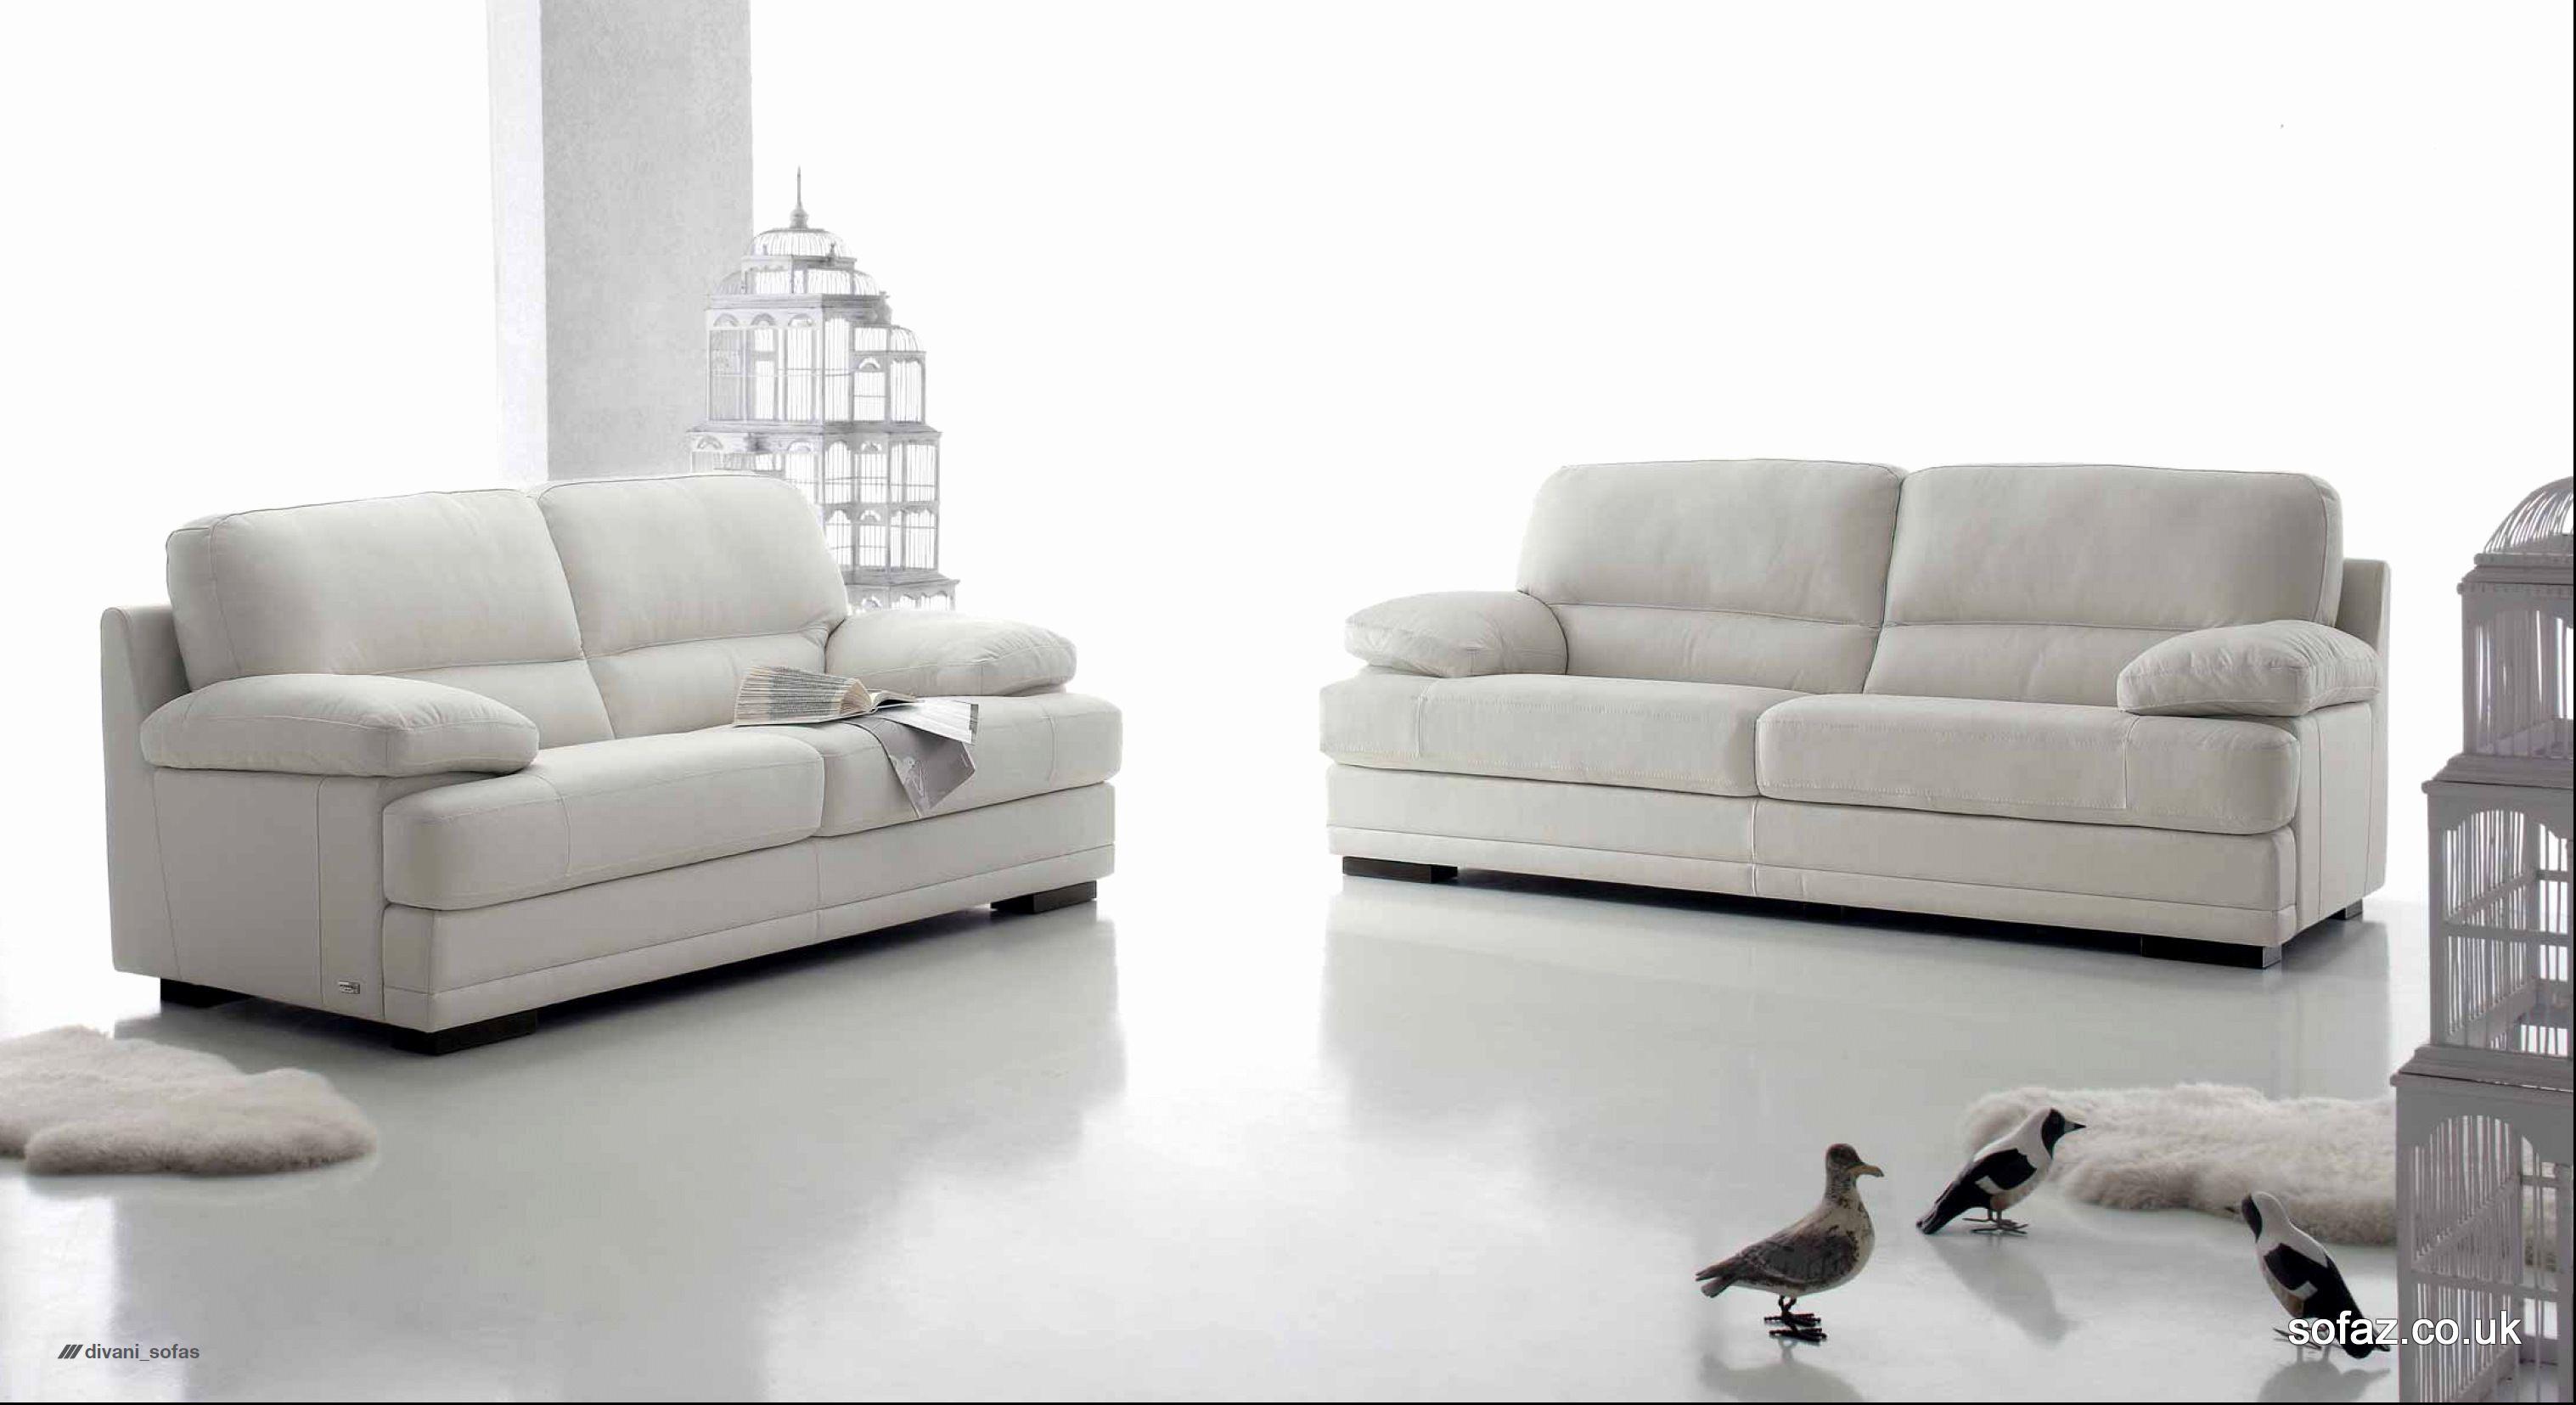 Ebay Real Leather Sofa Beds Antique Chaise Longue Italian Fabric Sofas Uk Modern Luxury Natuzzi Italia